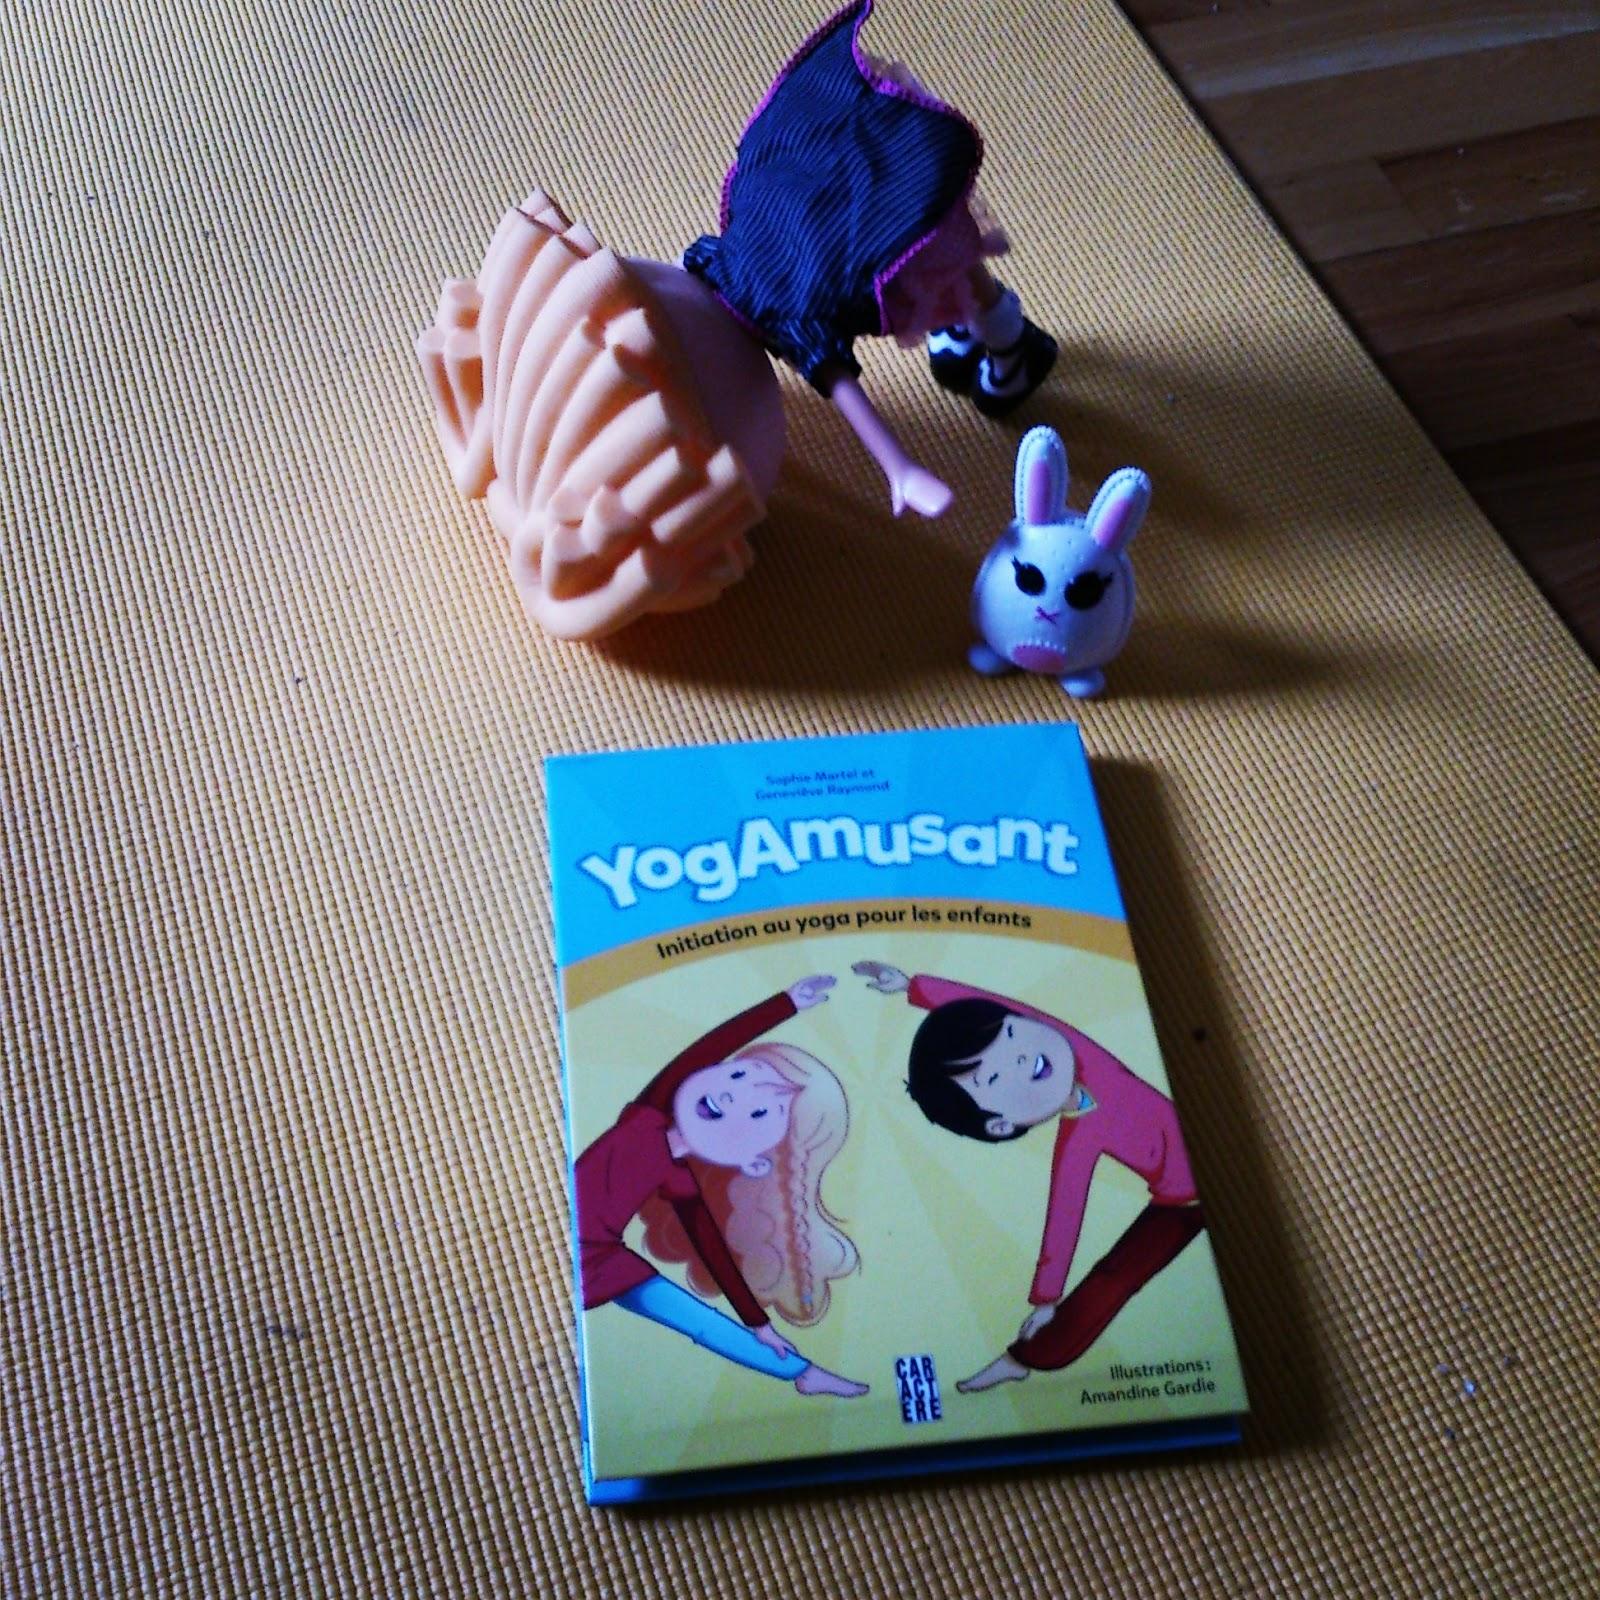 Yogamusant Le Livre Pour Les Mini Apprentis Yogi Etre